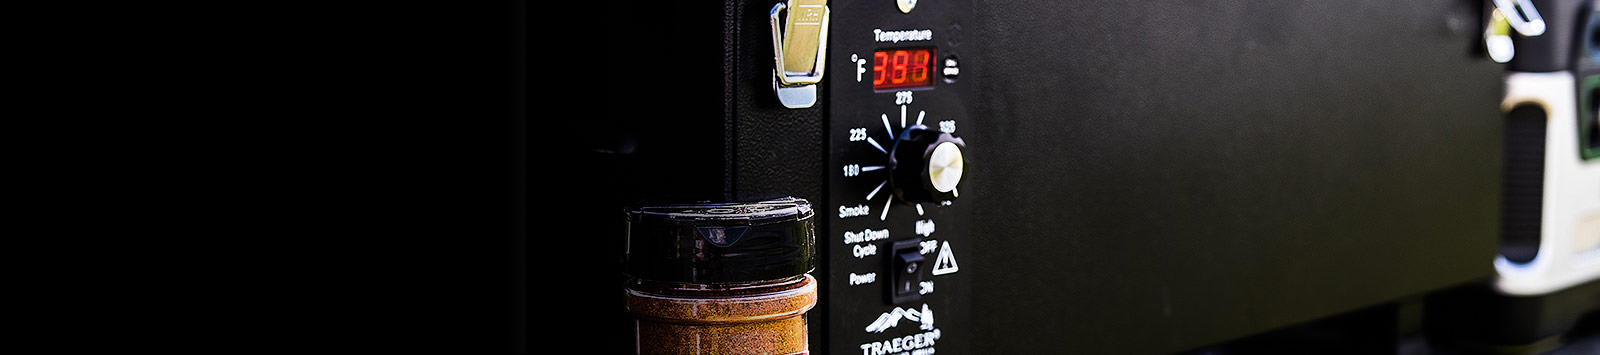 ptg digital thermostat kit traeger wood fired grills rh traegergrills com Traeger Thermometer Installation Traeger Thermometer Installation